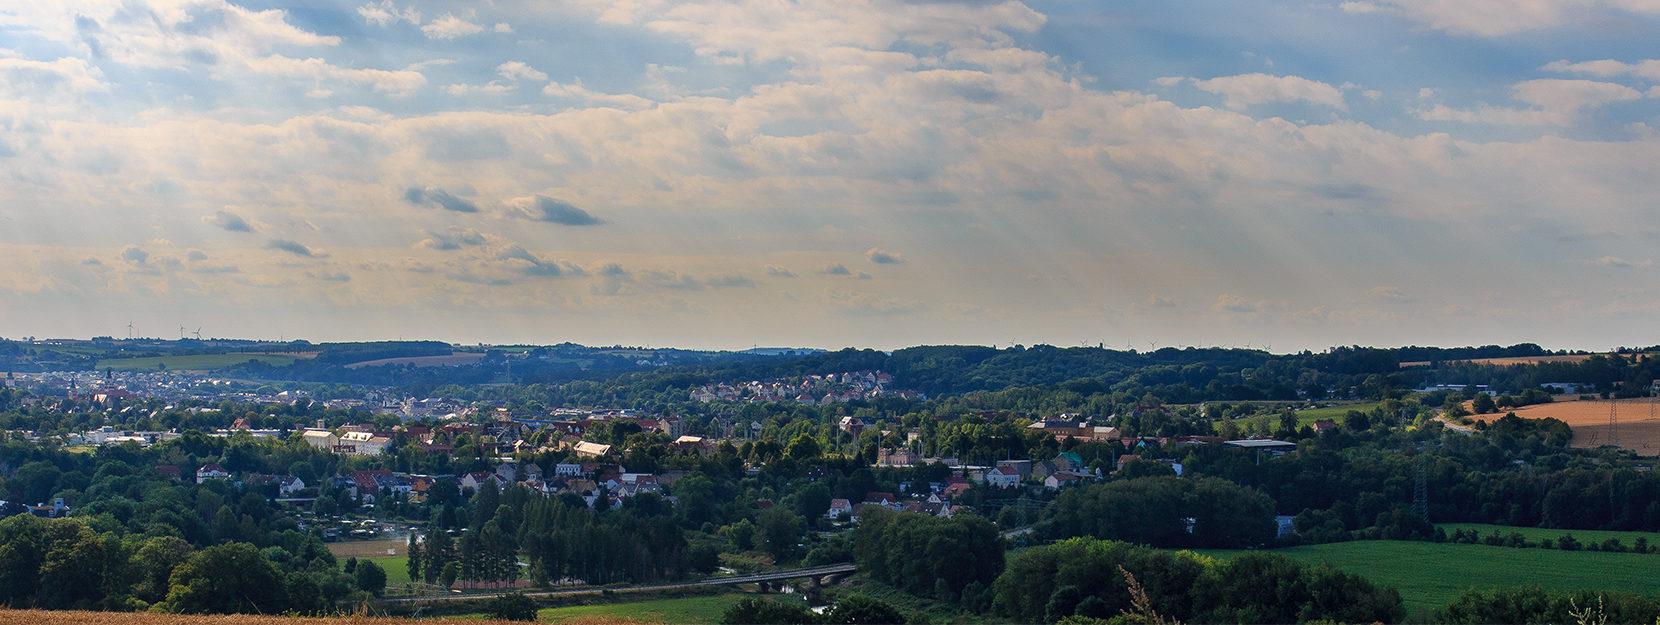 Ev.-Luth. Kirchenbezirk Leisnig-Oschatz